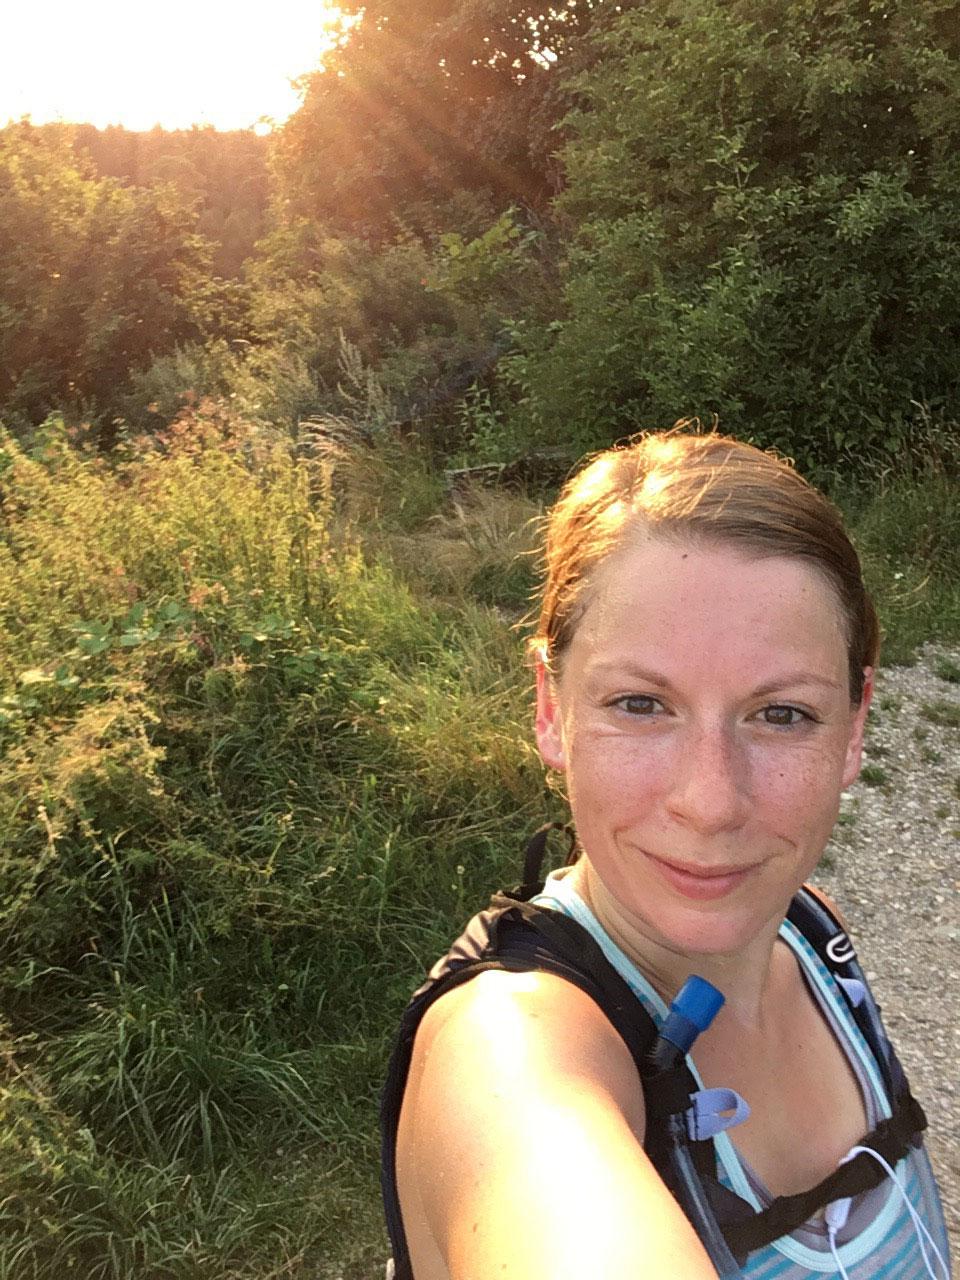 munichmountaingirls-bergblog-muenchen-julia-eisenhardt-mugl-wandern-berg-profil